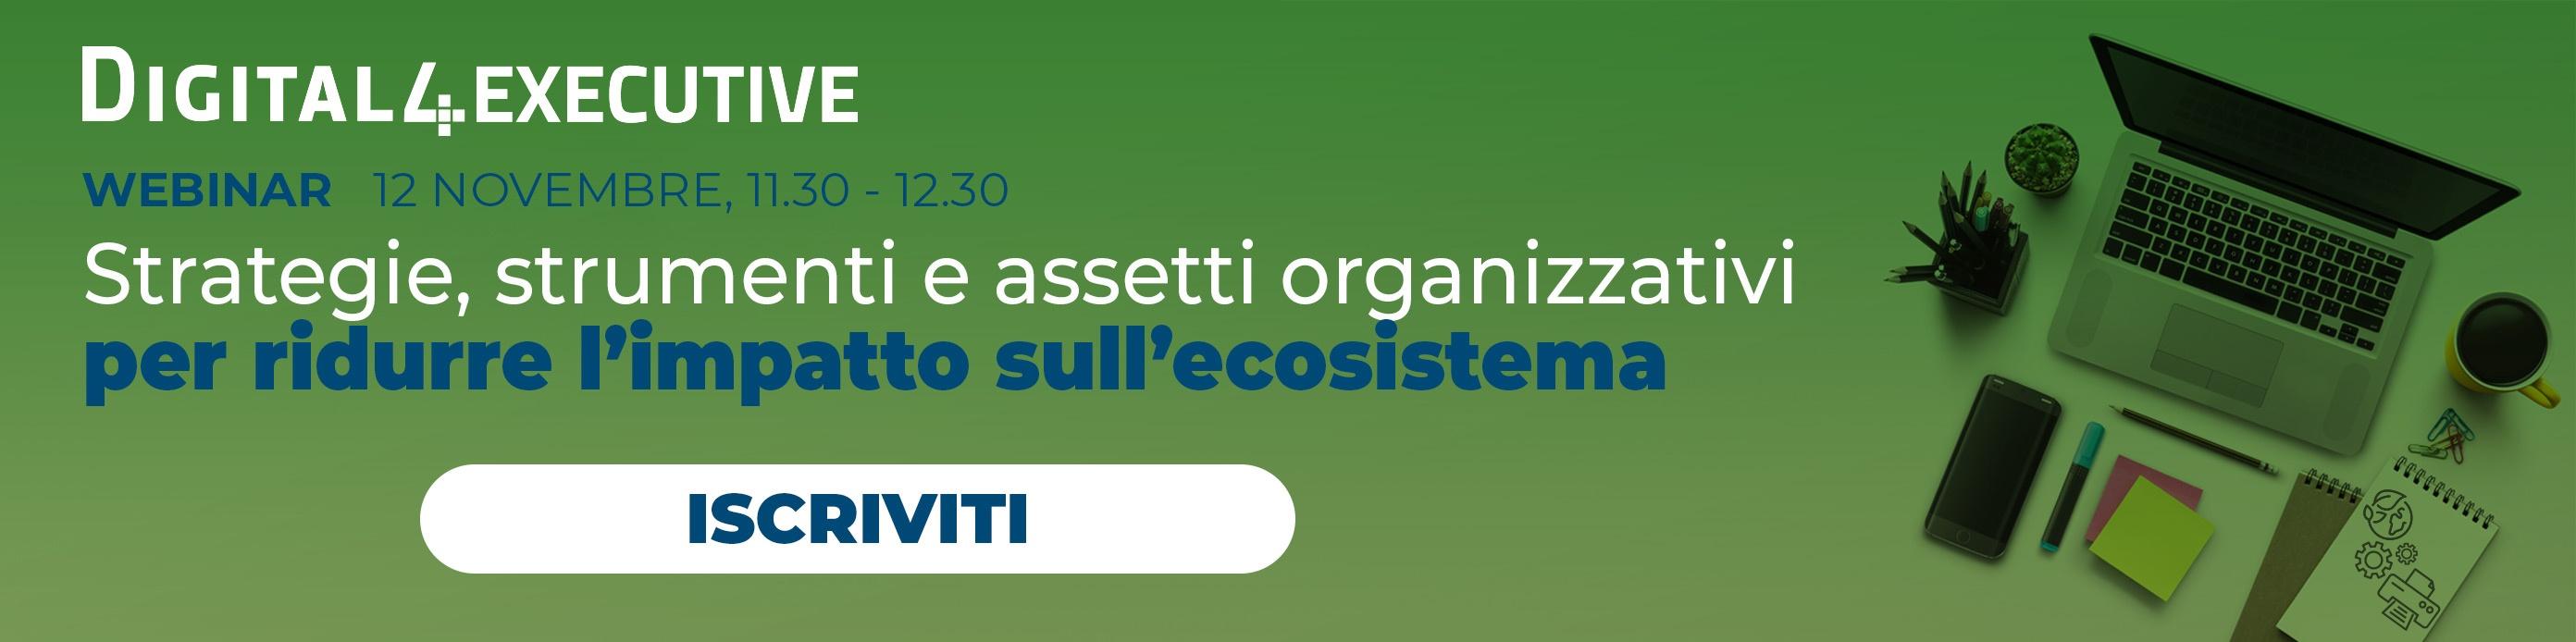 IBM Ecosystem Summit - Rivedi l'evento